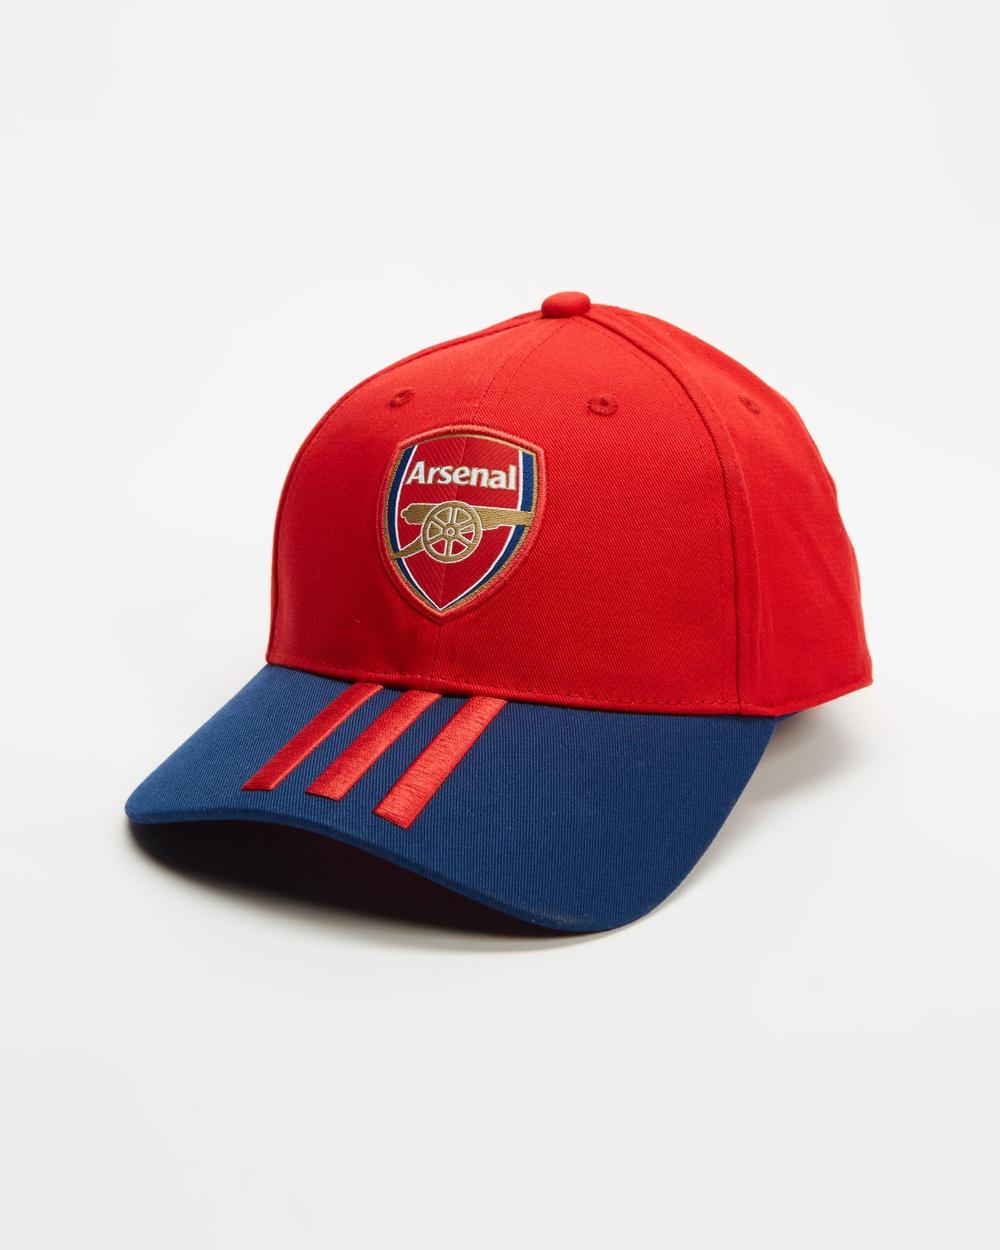 adidas Performance Arsenal FC Baseball Cap Headwear Scarlet & Mystery Blue